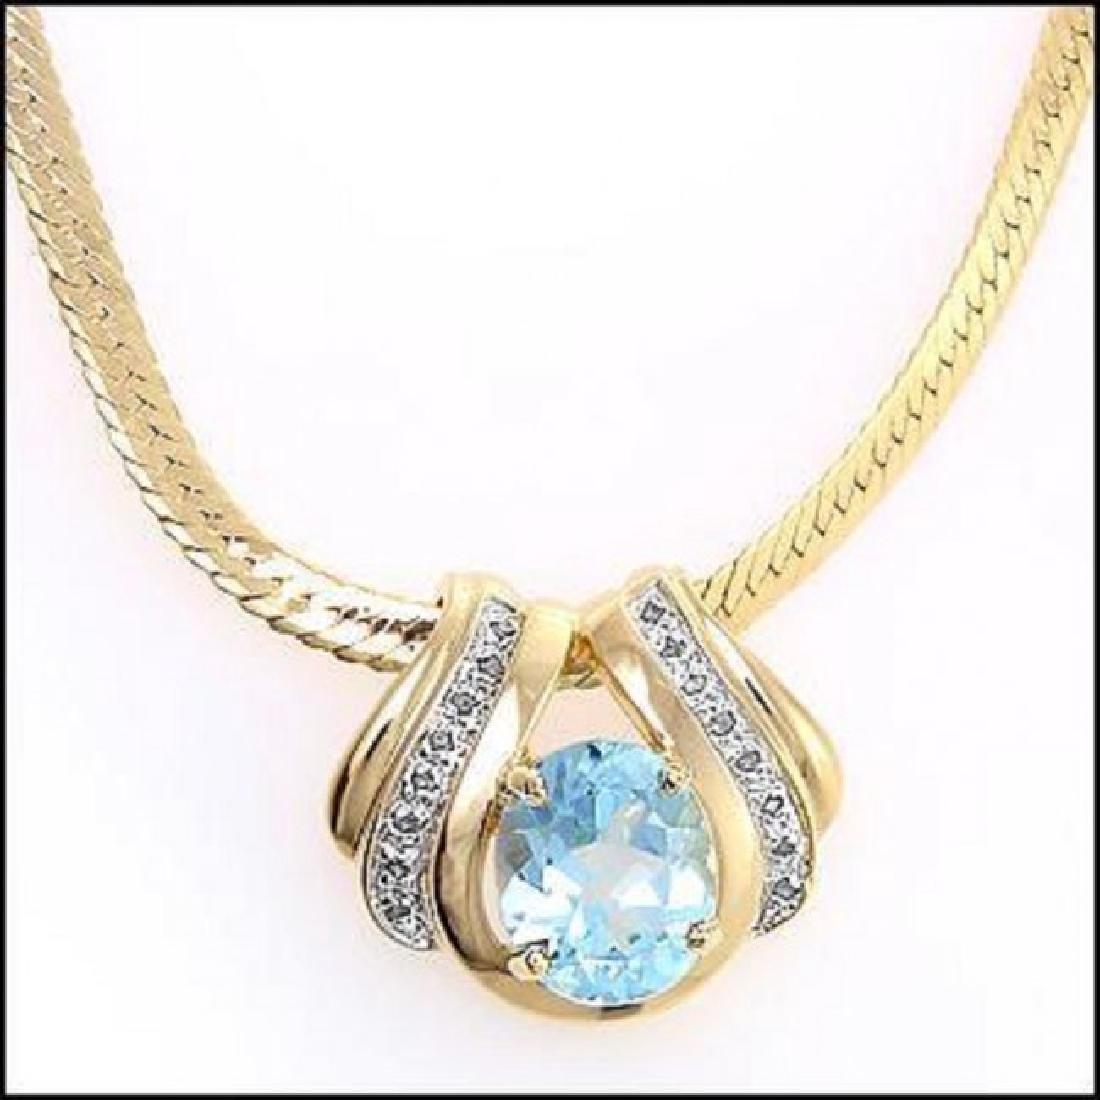 7.49 CT Blue Topaz & Diamond Designer Fine Necklace - 2